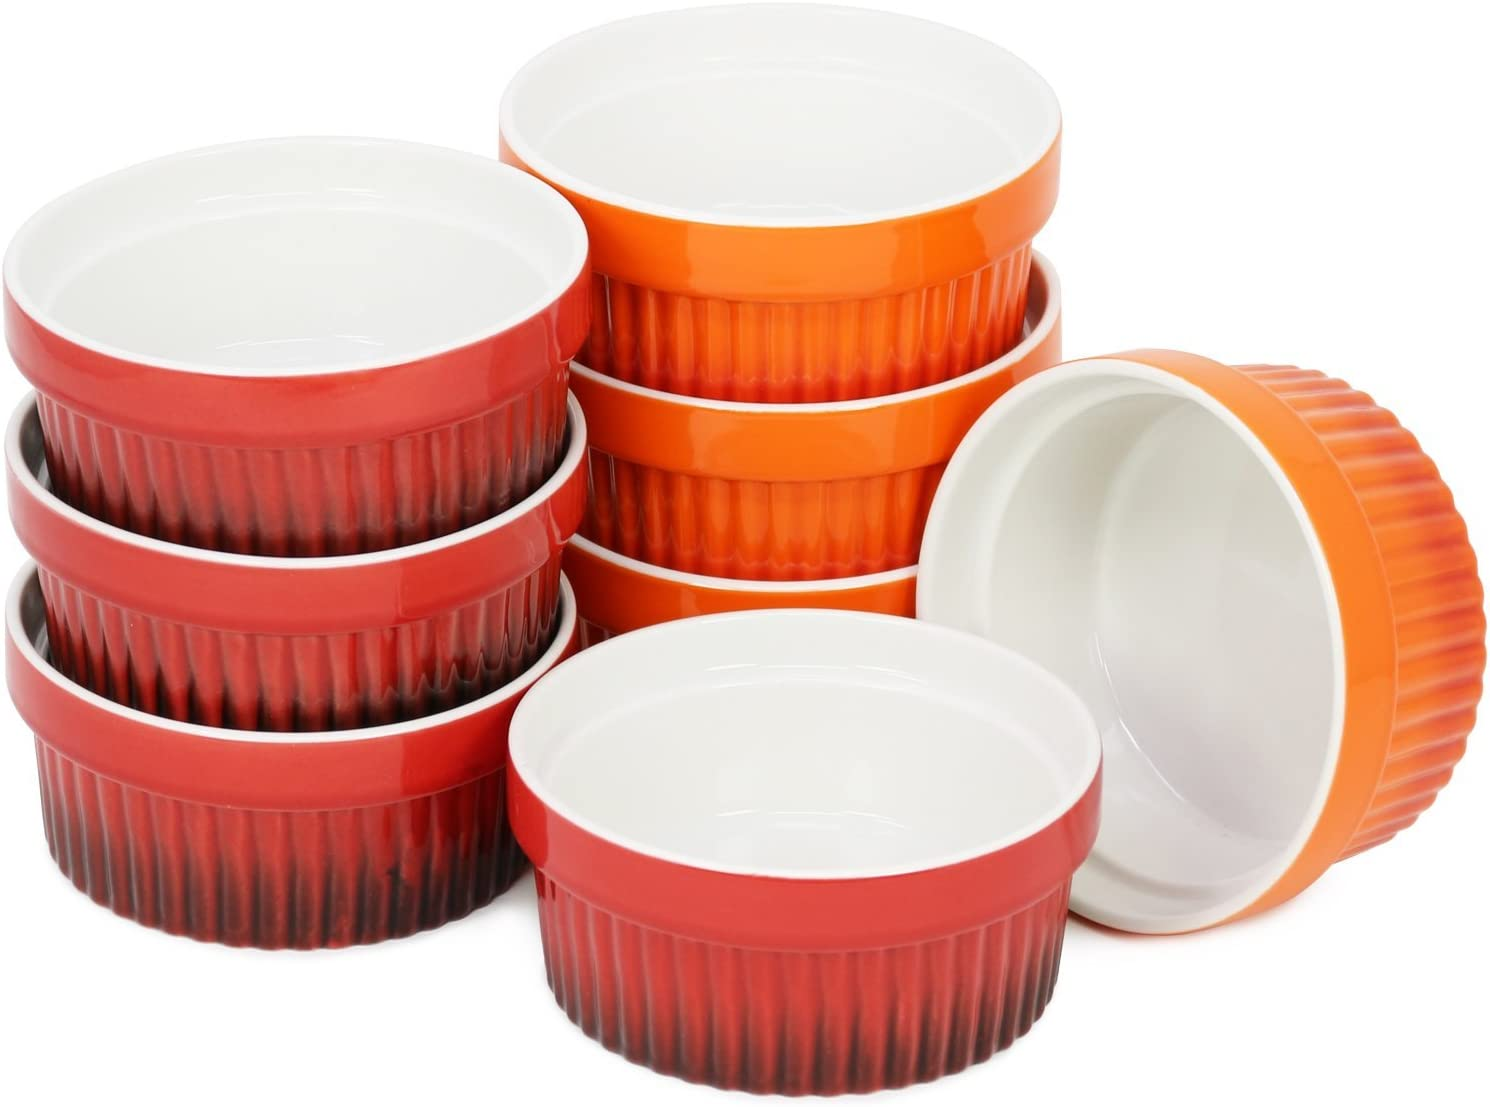 Creme Brulee cuencos cada 260 ml com-four/® 8x Ragout Fin Bowl XXL Postre bowl en naranja y rojo